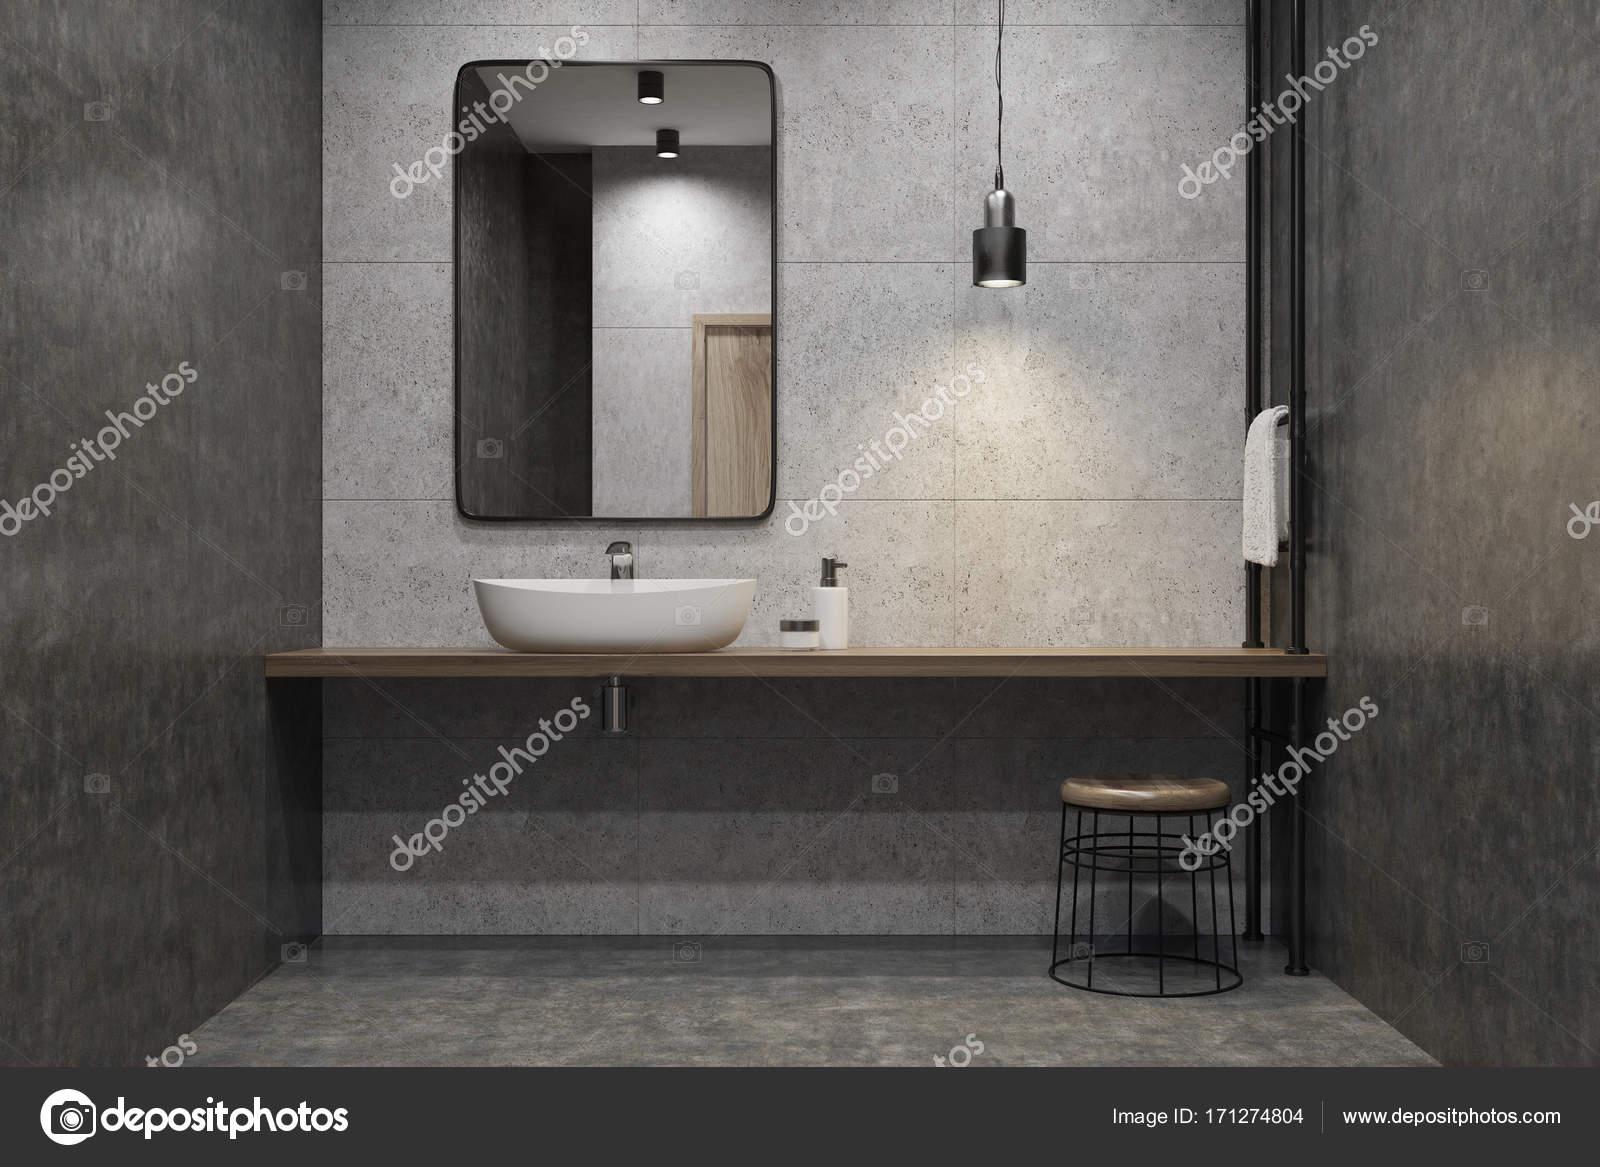 beton bad waschbecken spiegel stockfoto denisismagilov 171274804. Black Bedroom Furniture Sets. Home Design Ideas